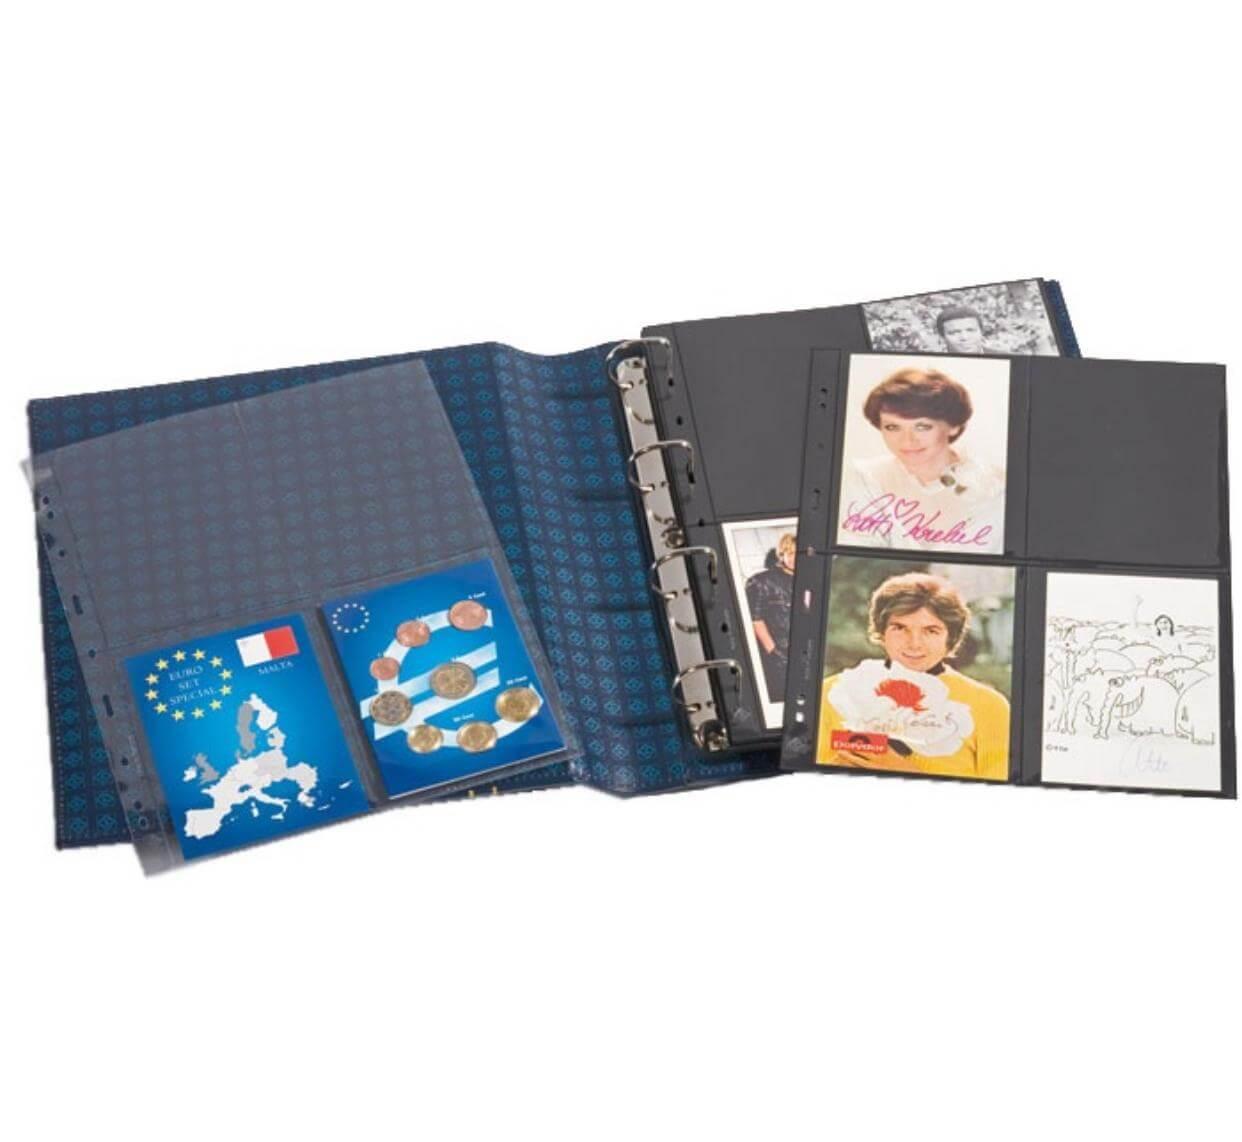 Álbum Leuchtturm Classic Grande com Box - Ref. 317159